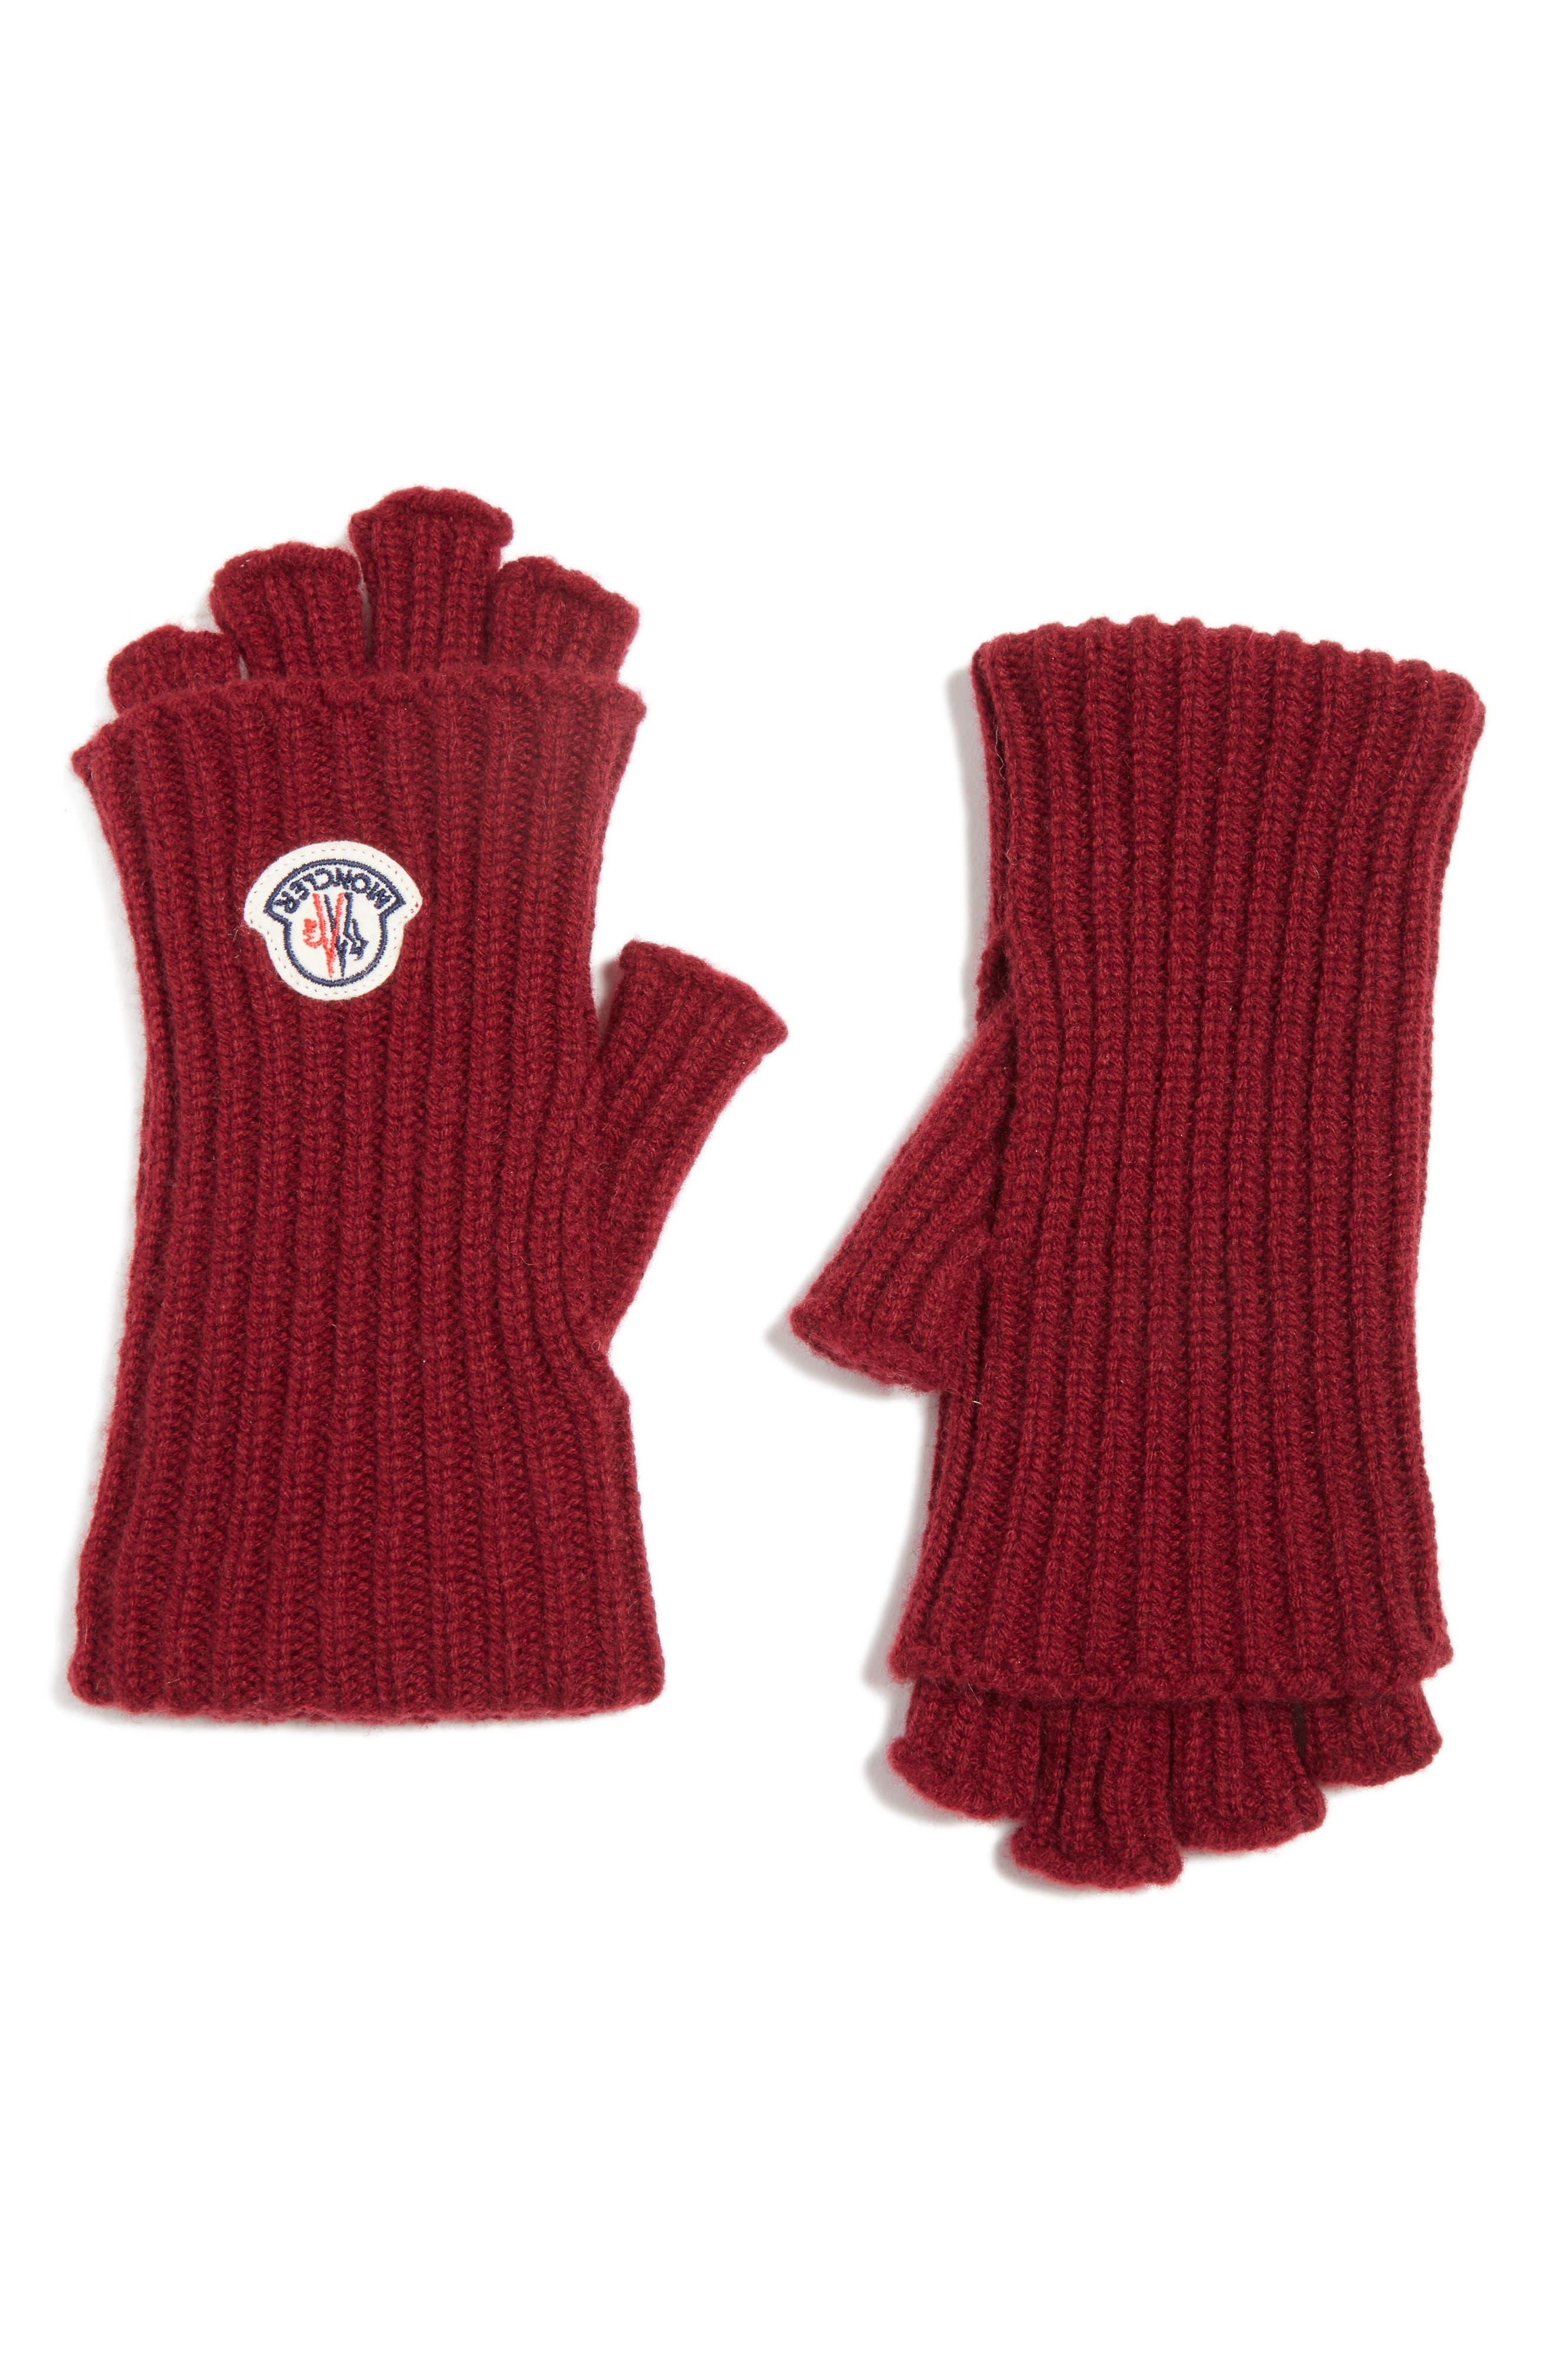 Moncler Guanti Wool & Cashmere Long Fingerless Gloves